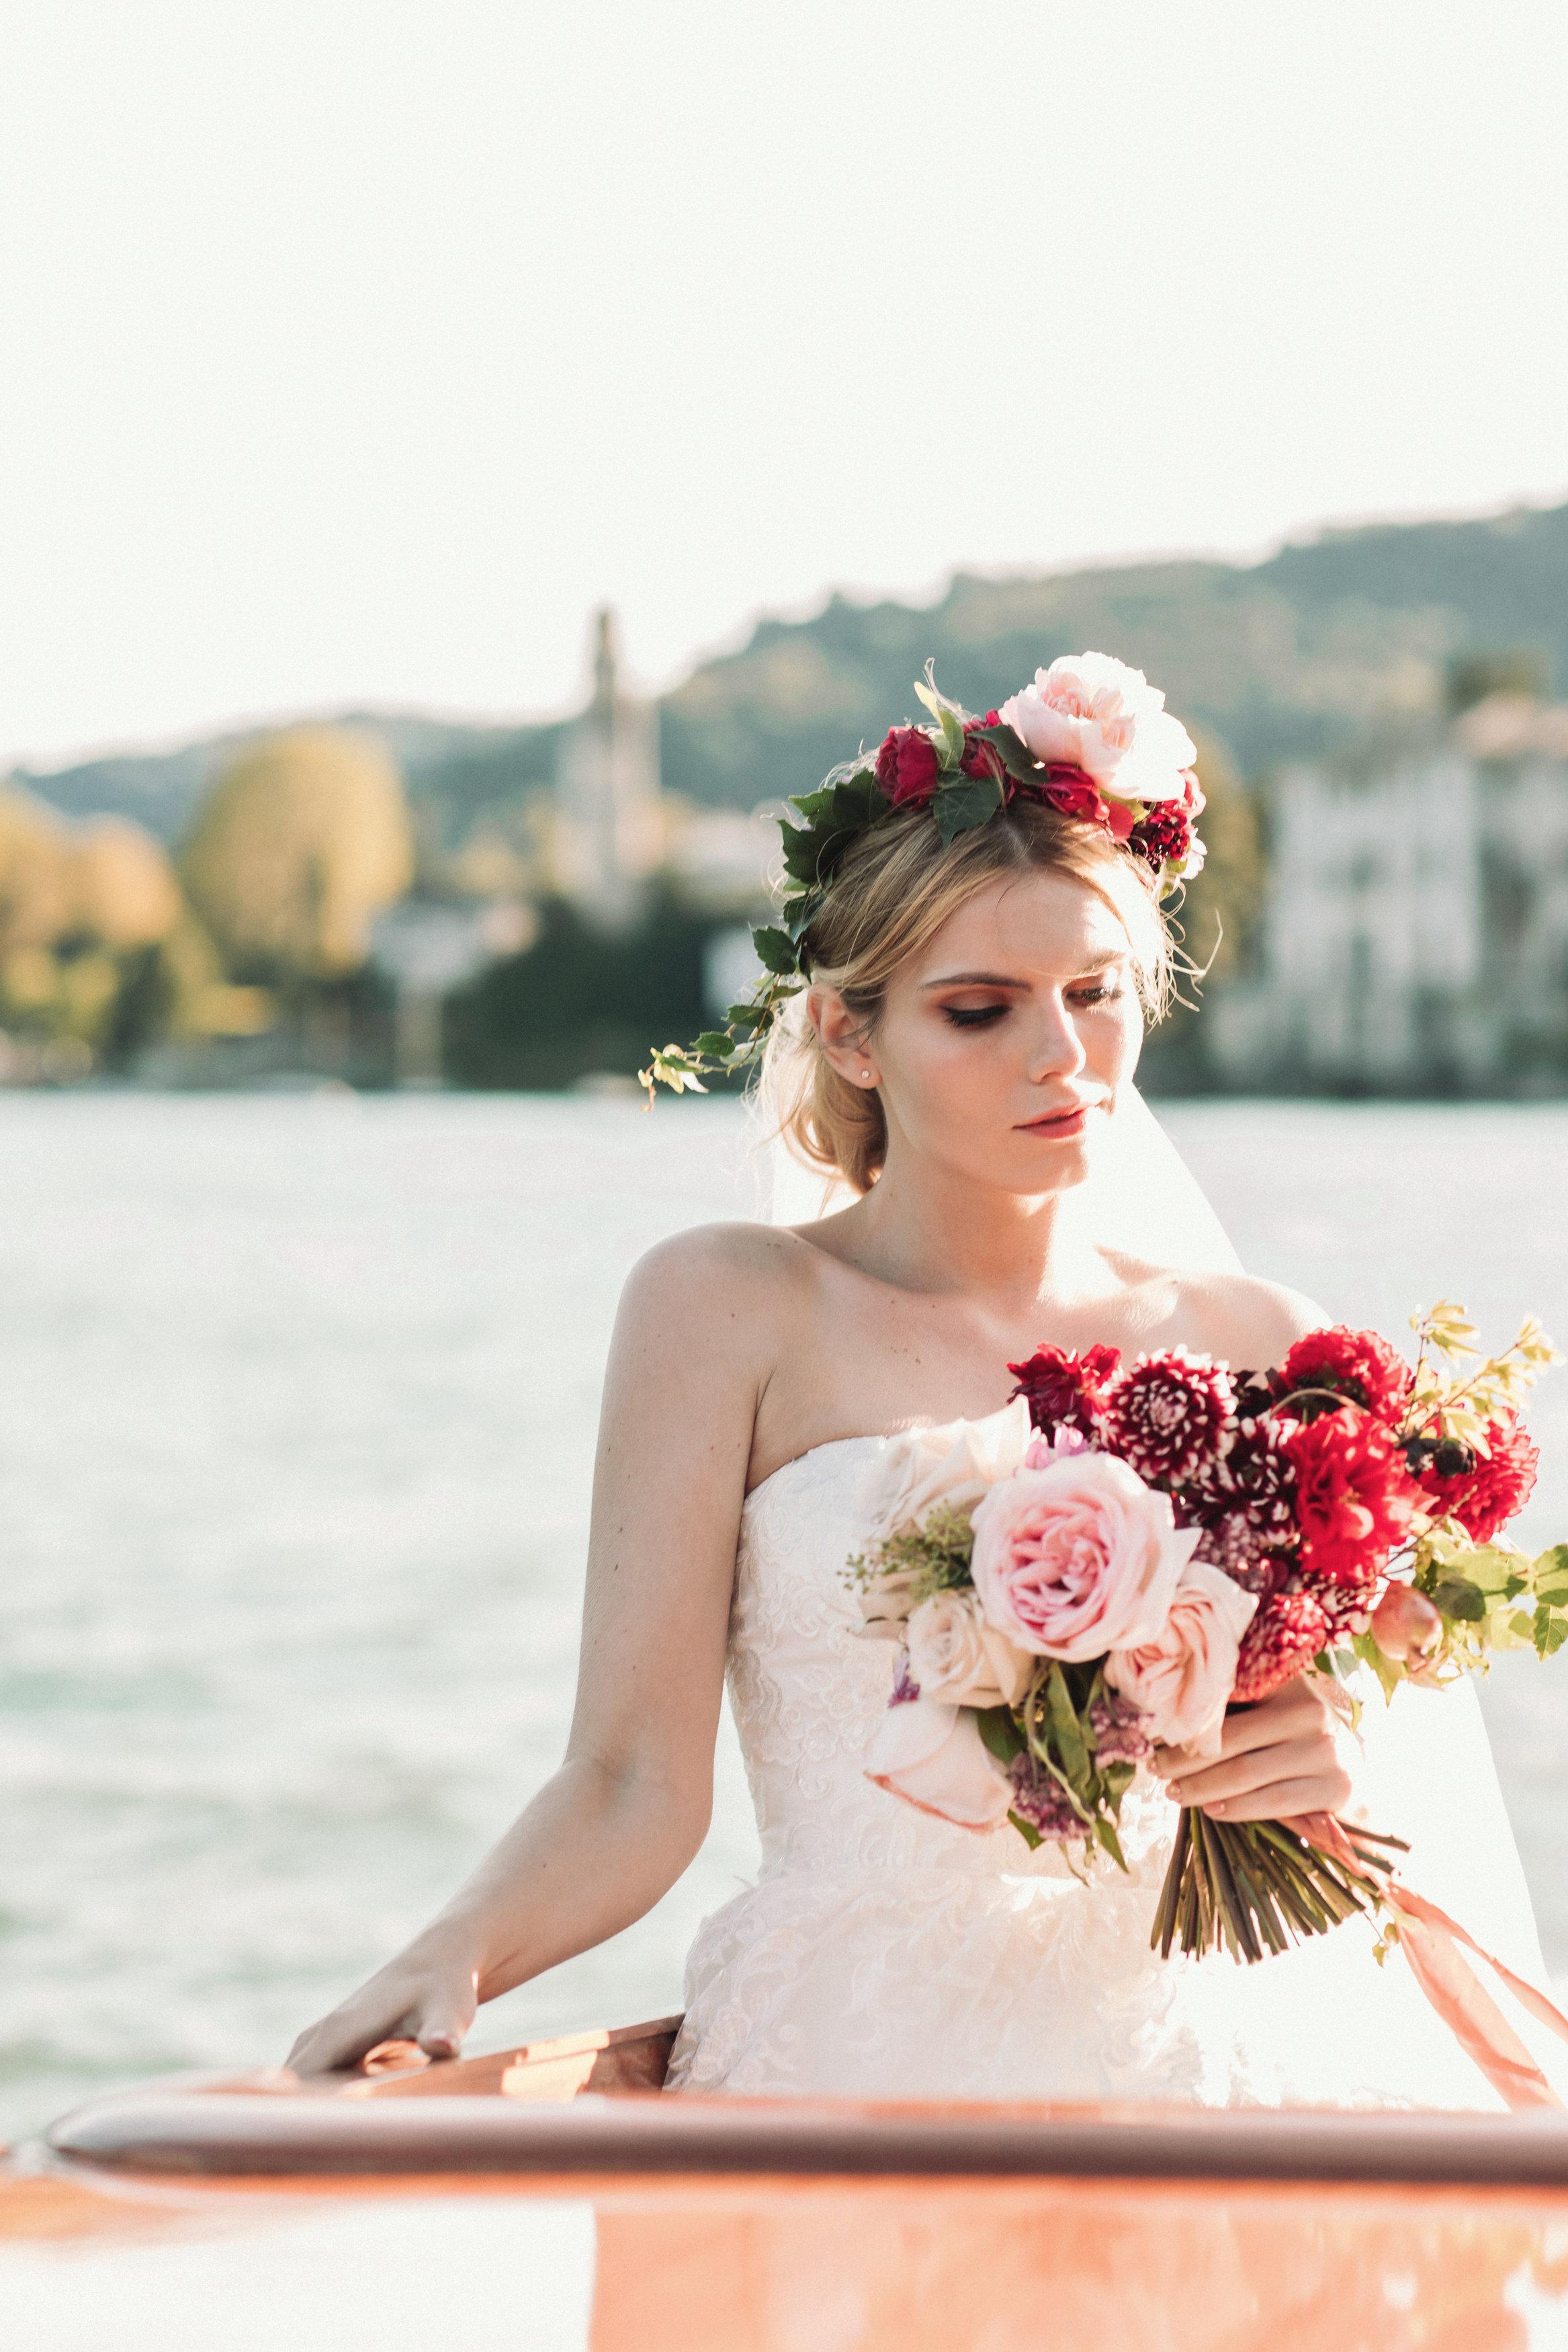 Karolina Vitaly September 03 2017 Como Italy-Ceremony-0008.jpg